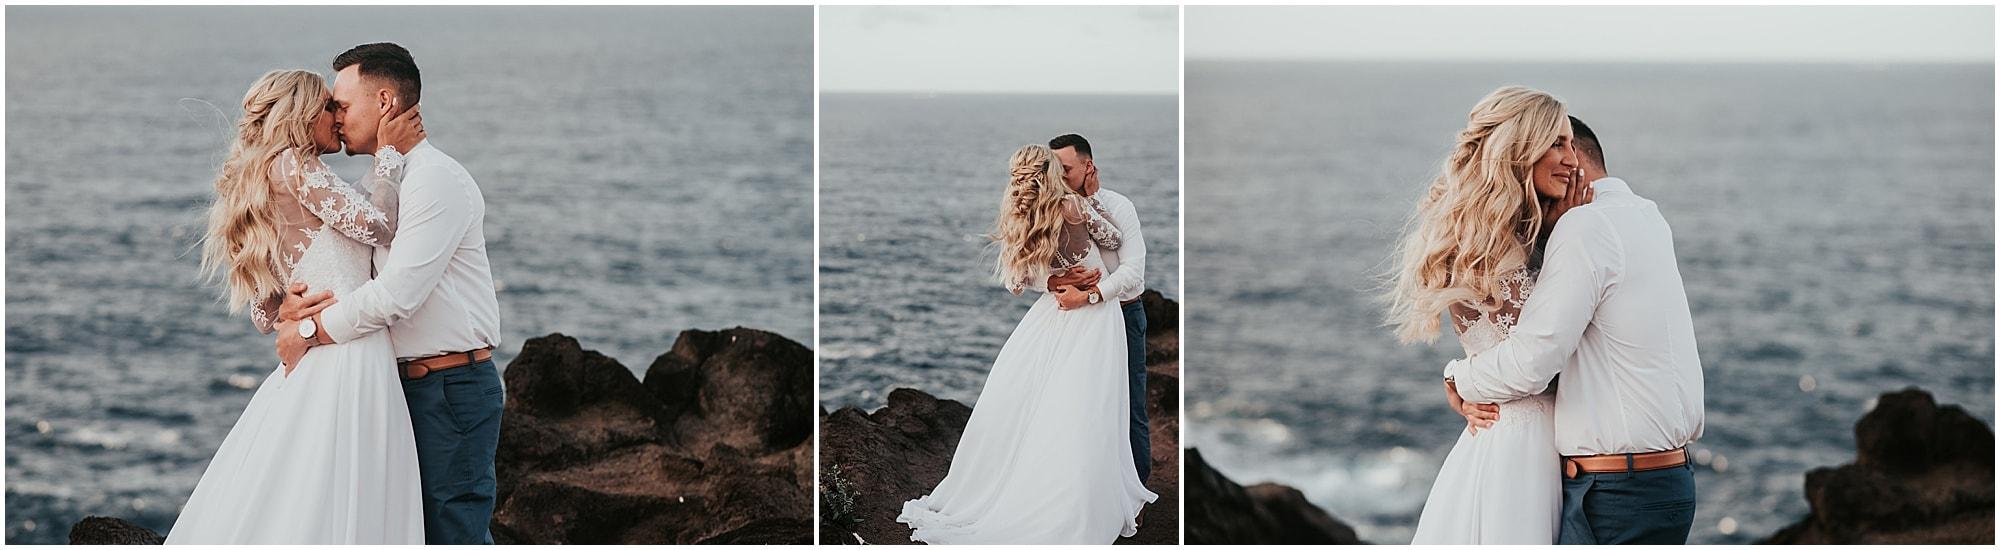 Maui wedding photographer25